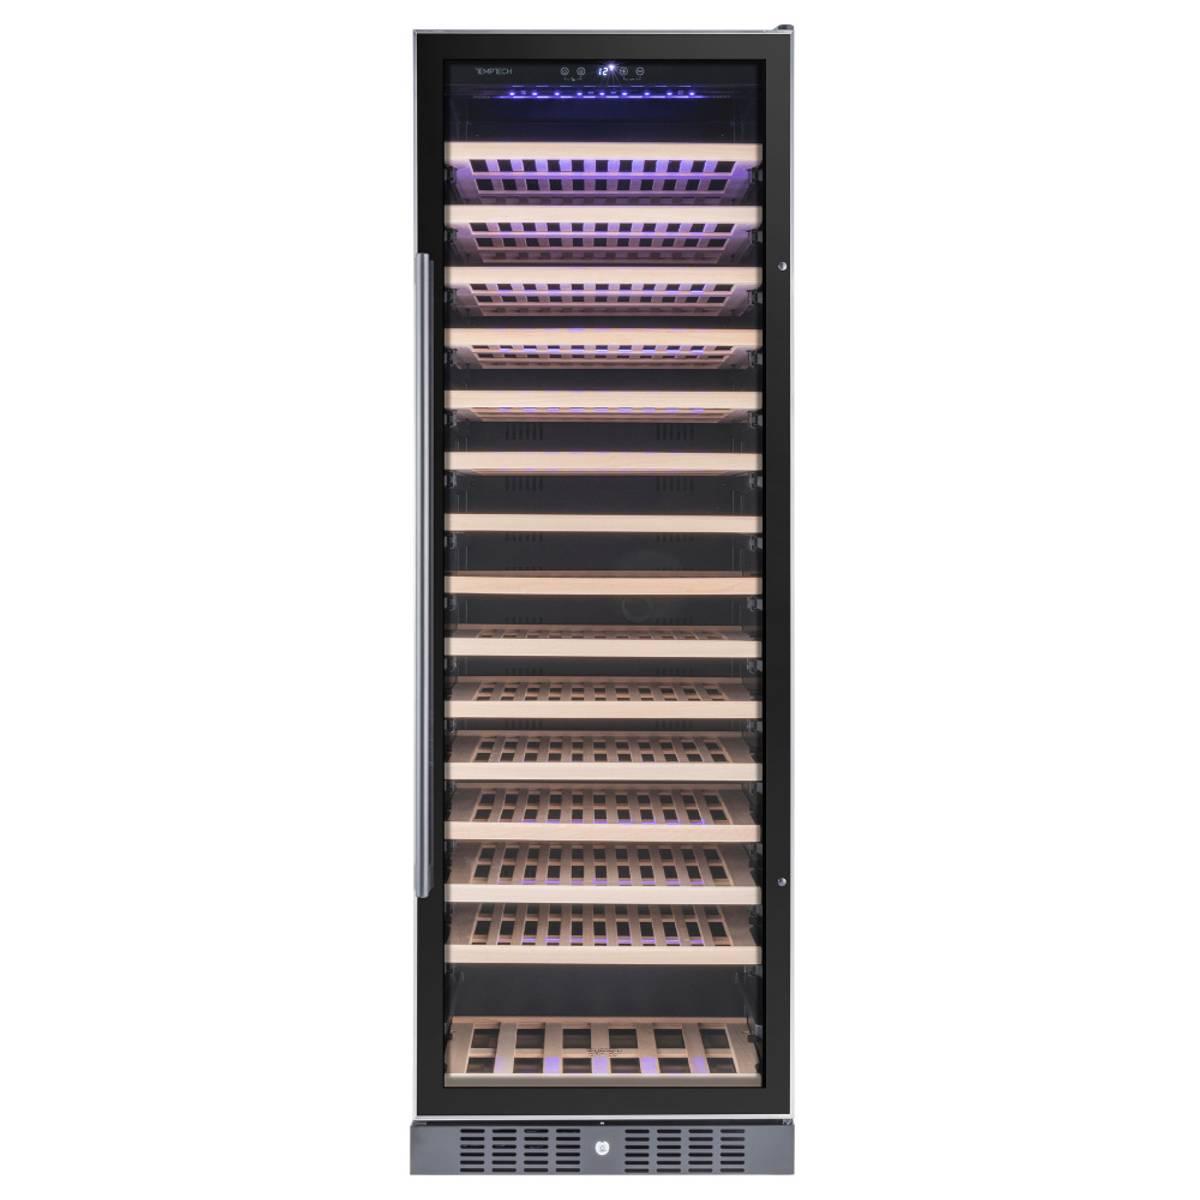 Temptech Premium vinskap, 1 sone, 166 flasker